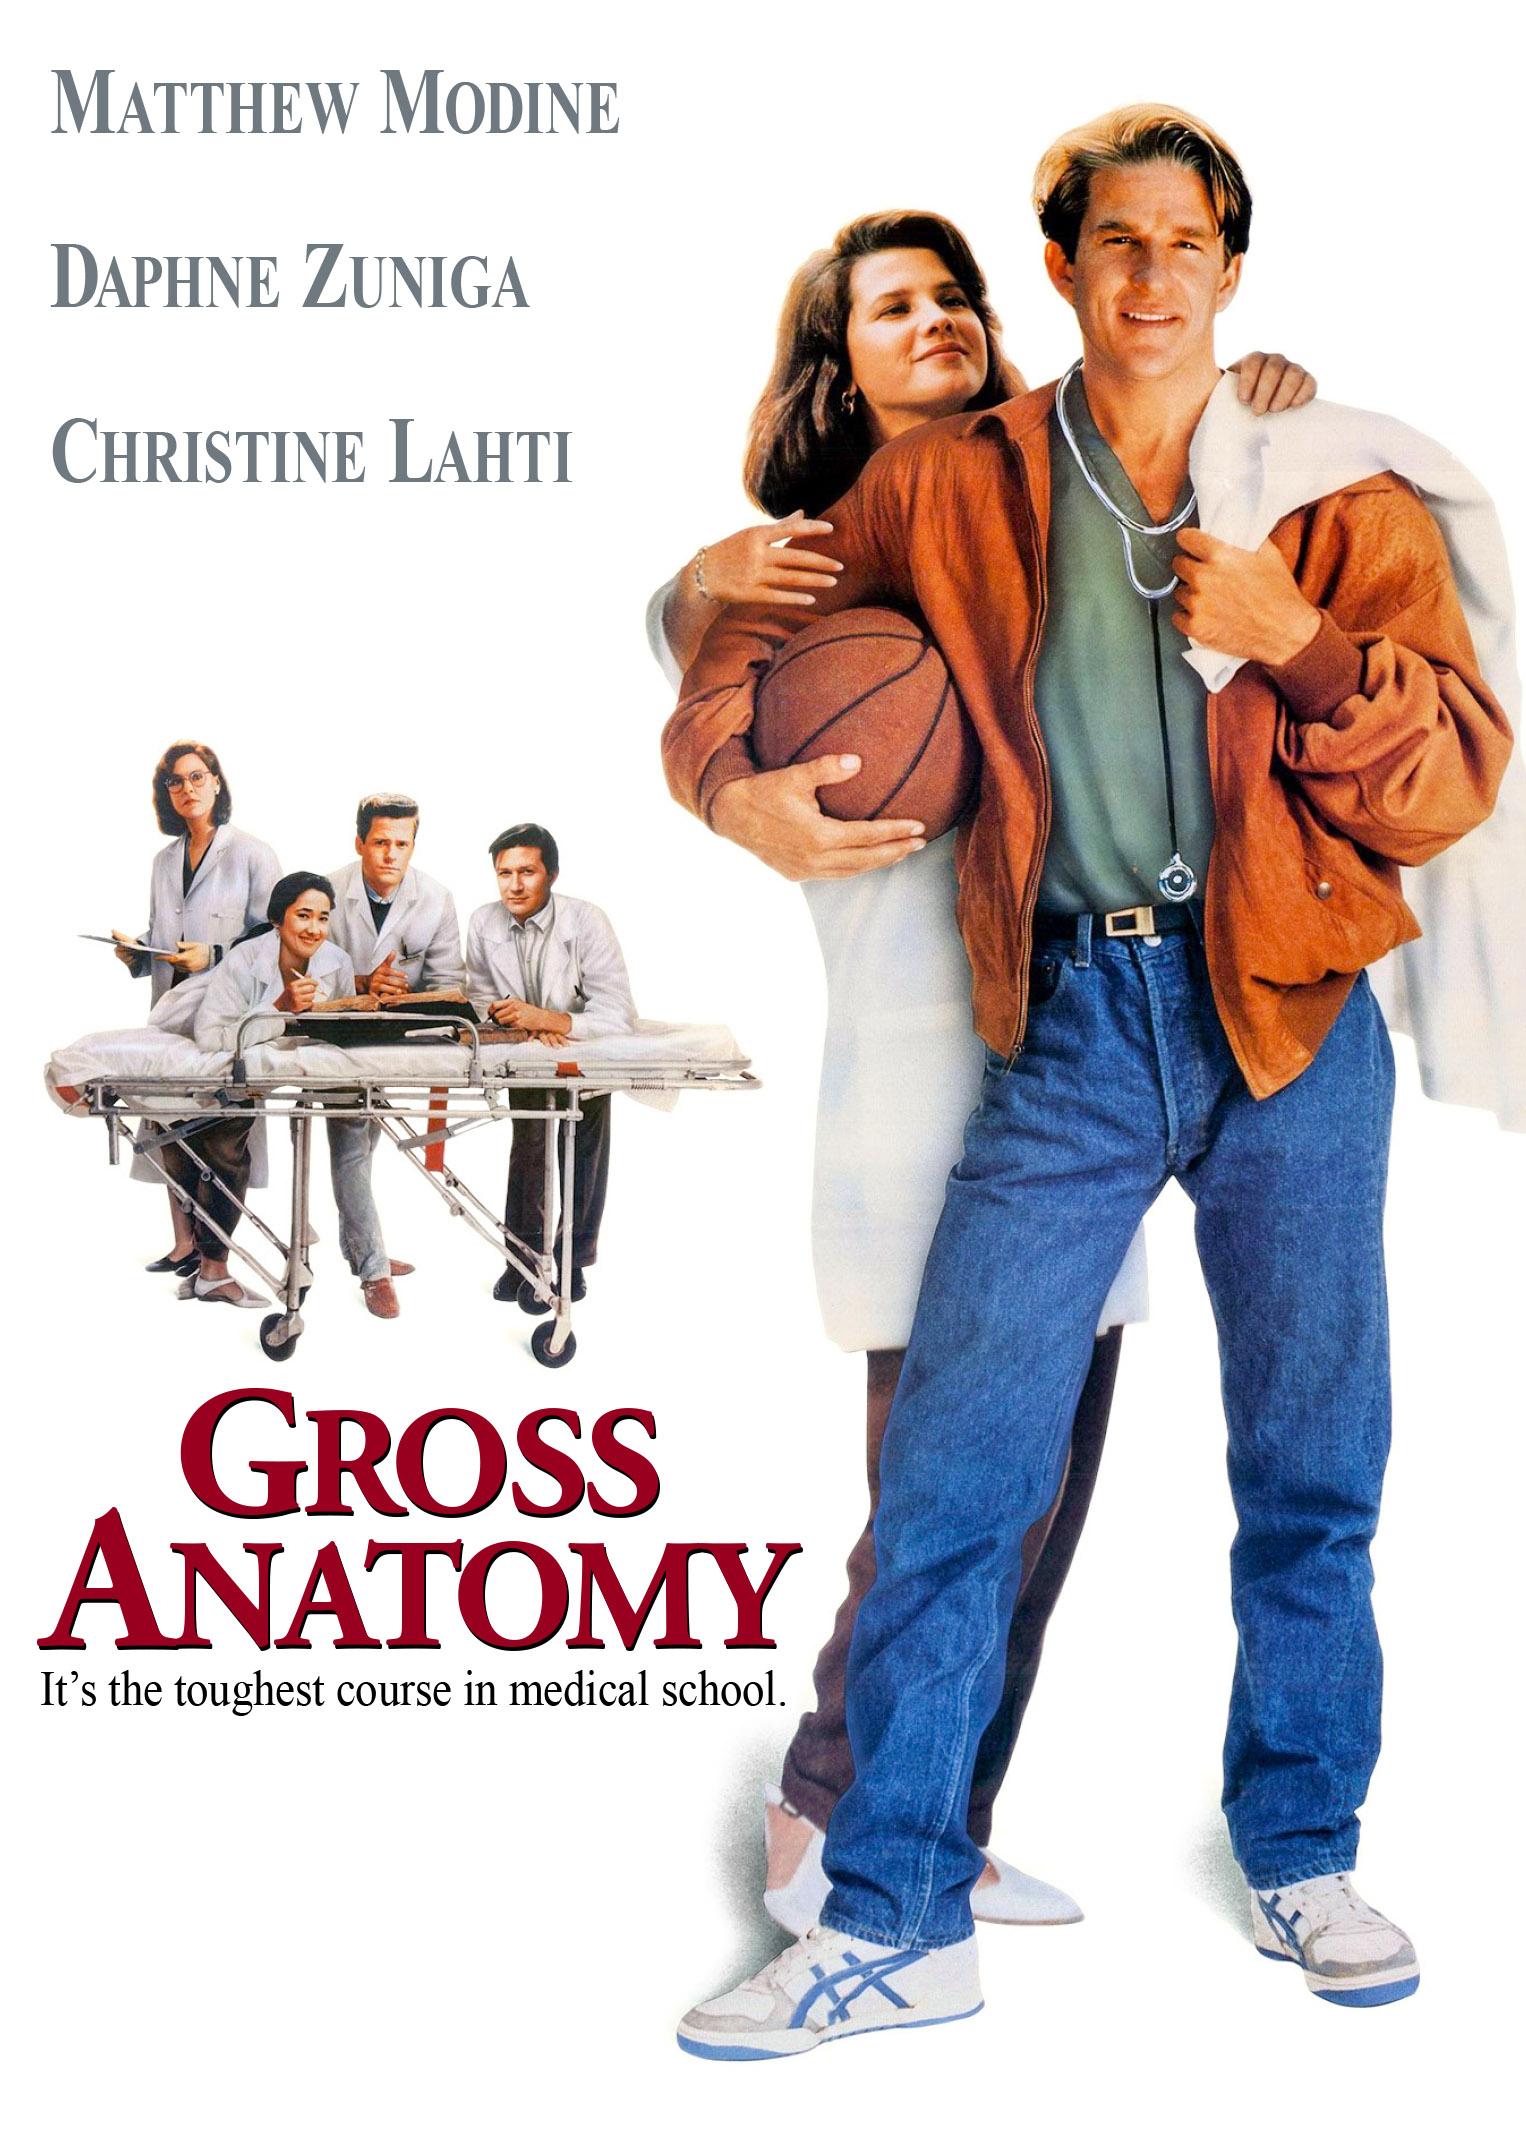 Gross Anatomy (Special Edition) (DVD) - Kino Lorber Home Video